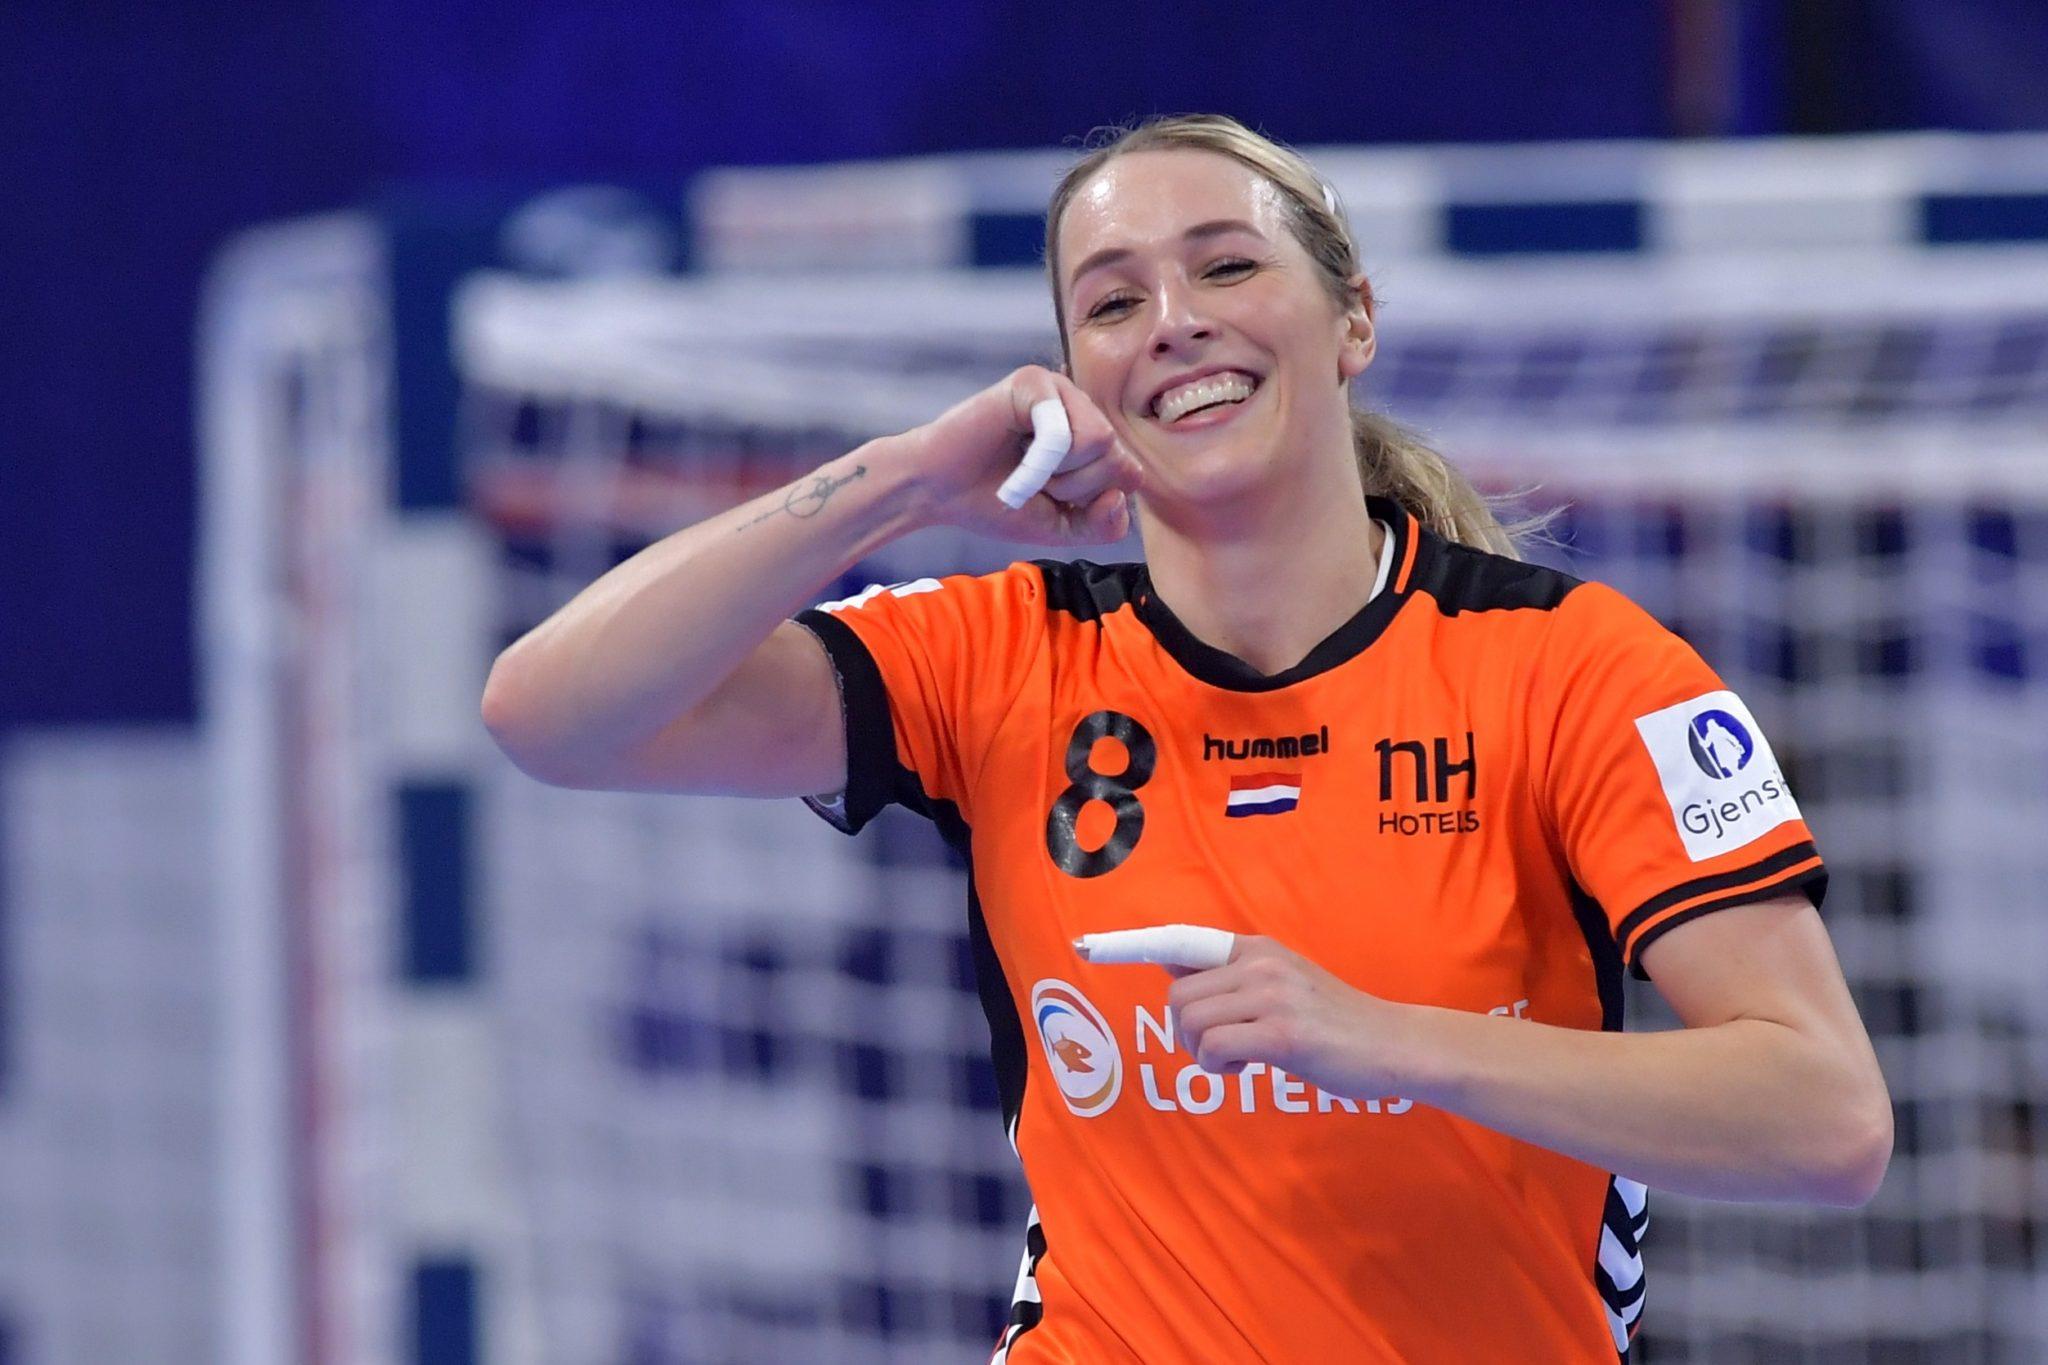 12-12-2018: Handbal: Vrouwen Nederland V Duitsland: Nancy EK Handbal In Frankrijk, Hoofdronde Groep II Nederland - Duitsland Lois Abbingh #8 NED